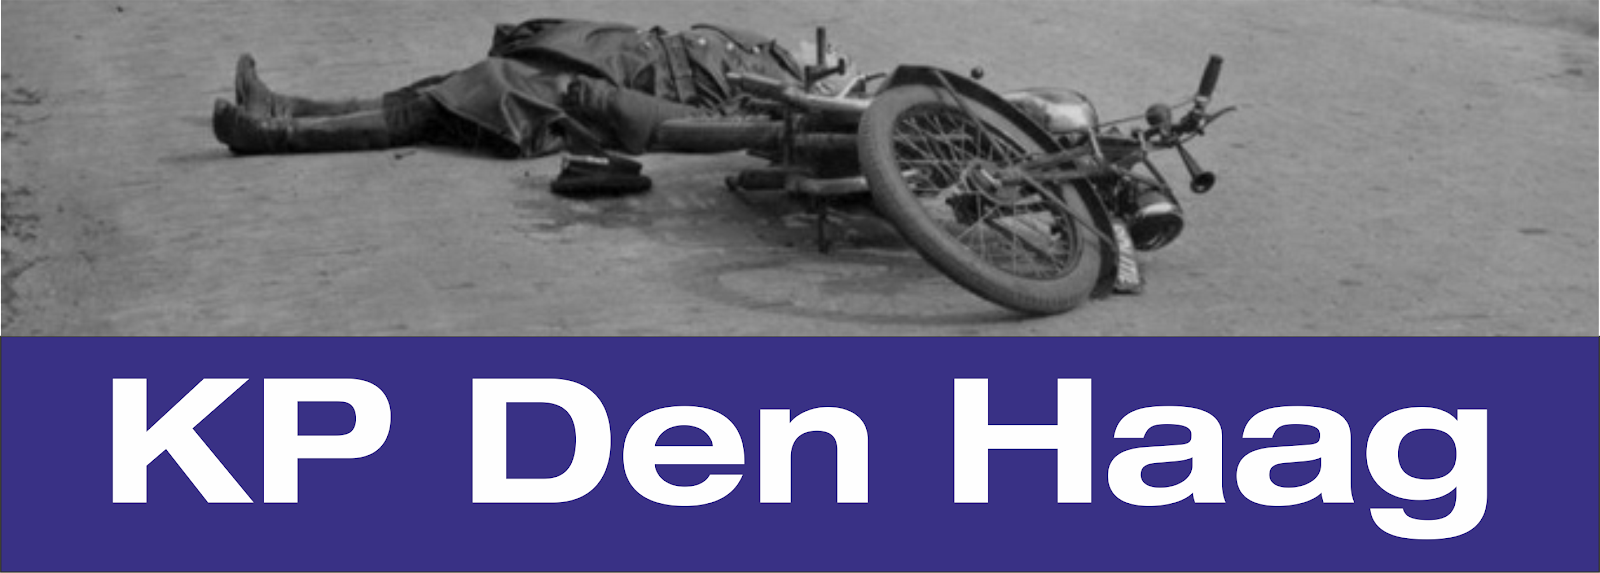 KP Den Haag banner.png